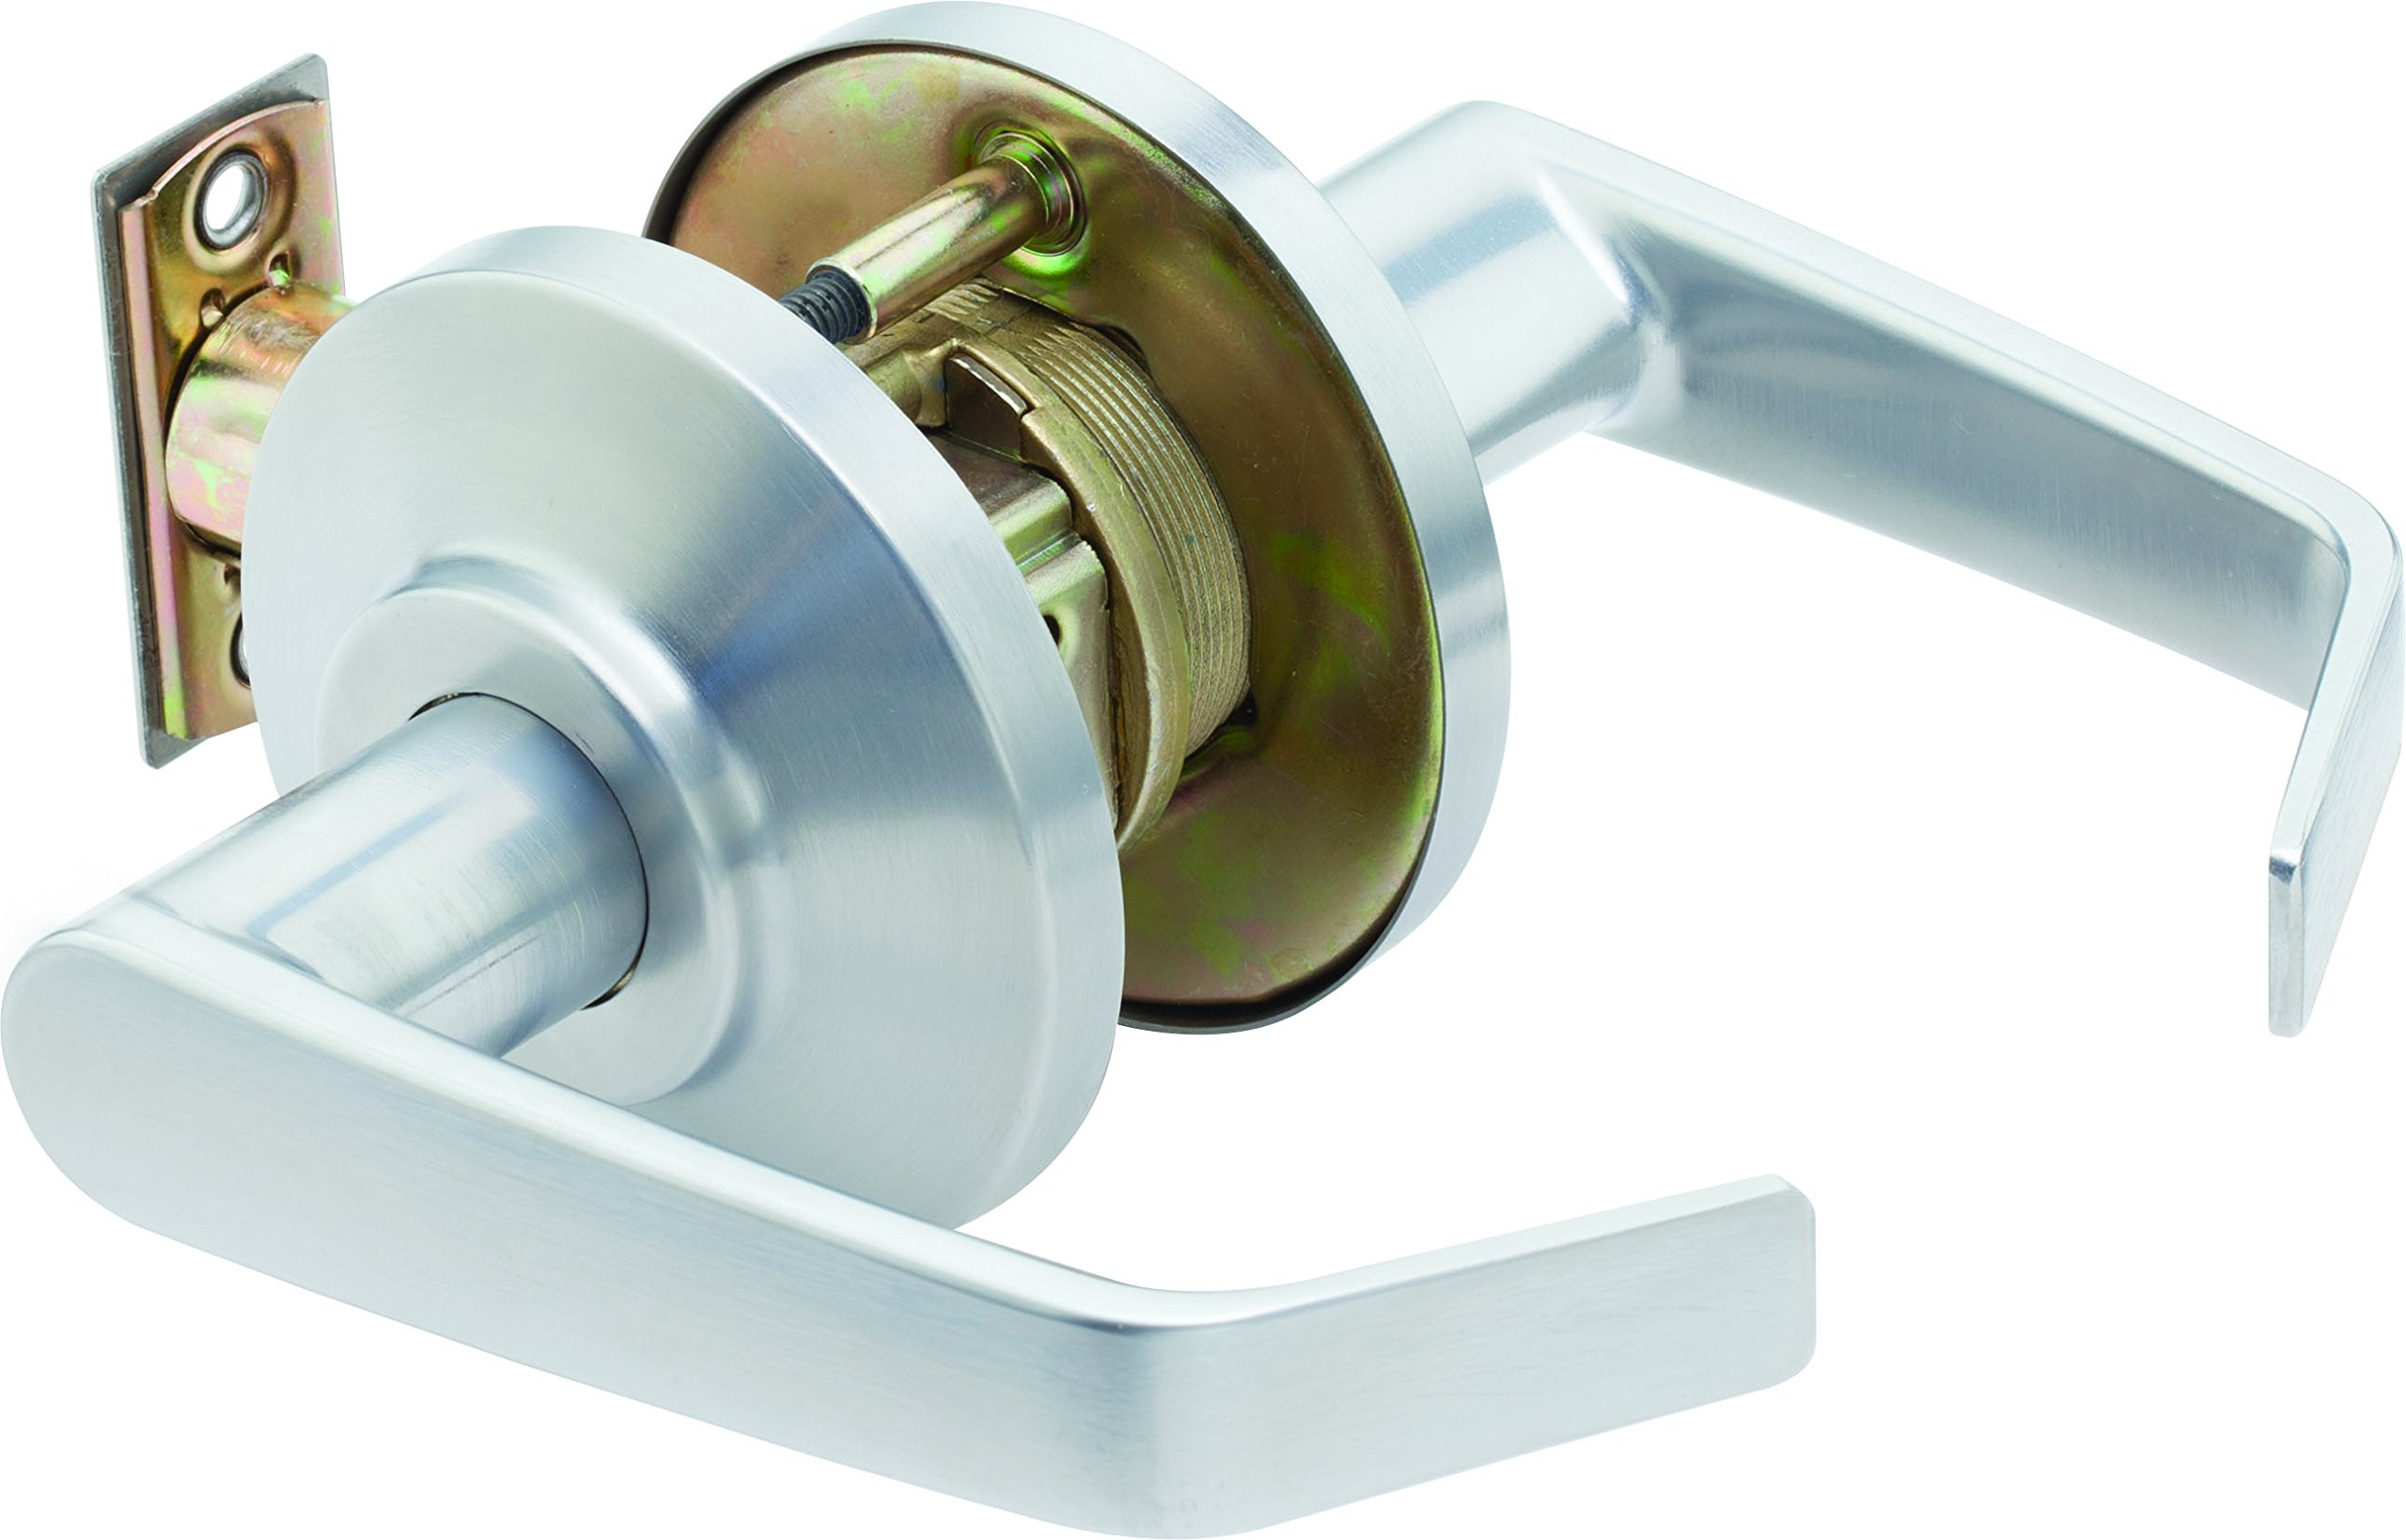 Stanley Best 7KC 30 N 15D S3 626 Keyless Contour Angle Return Medium Duty Lockset, Passage, Satin Chrome, 2''